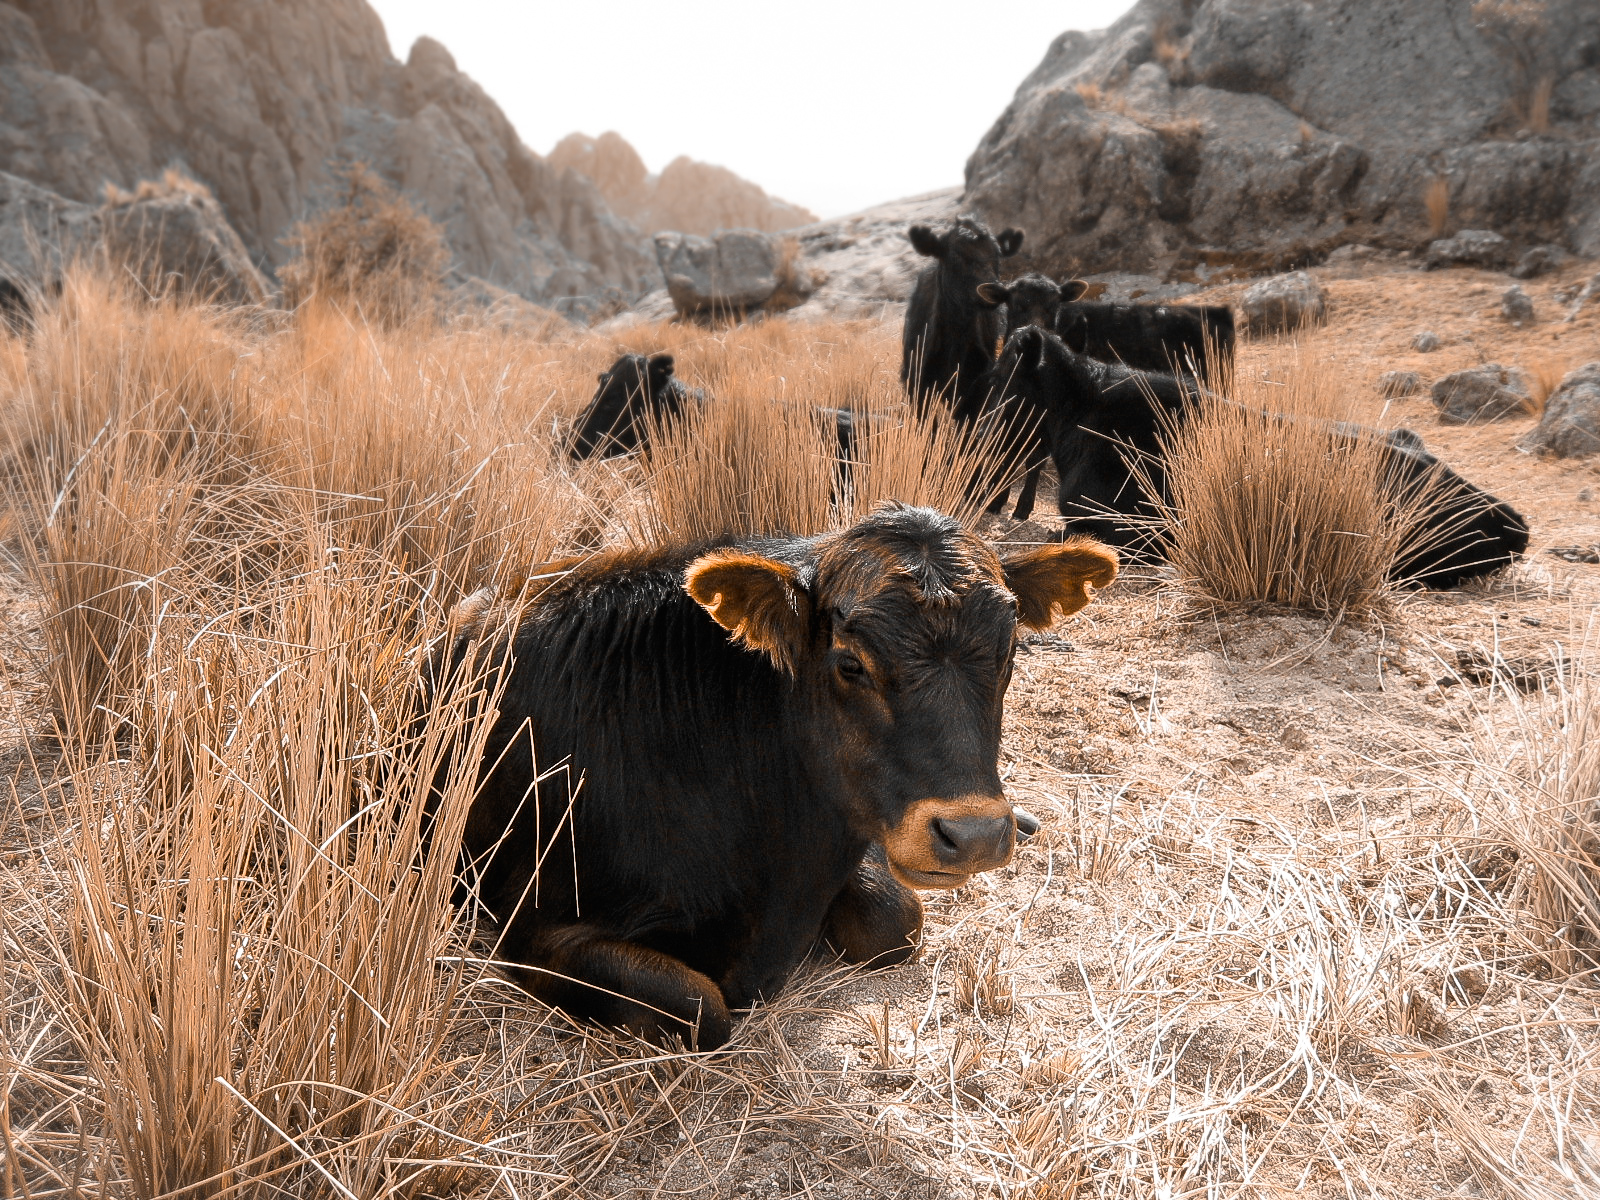 cordoba_los-gigantes_hostel-excursion-1890-cows-in-long-grass.jpg